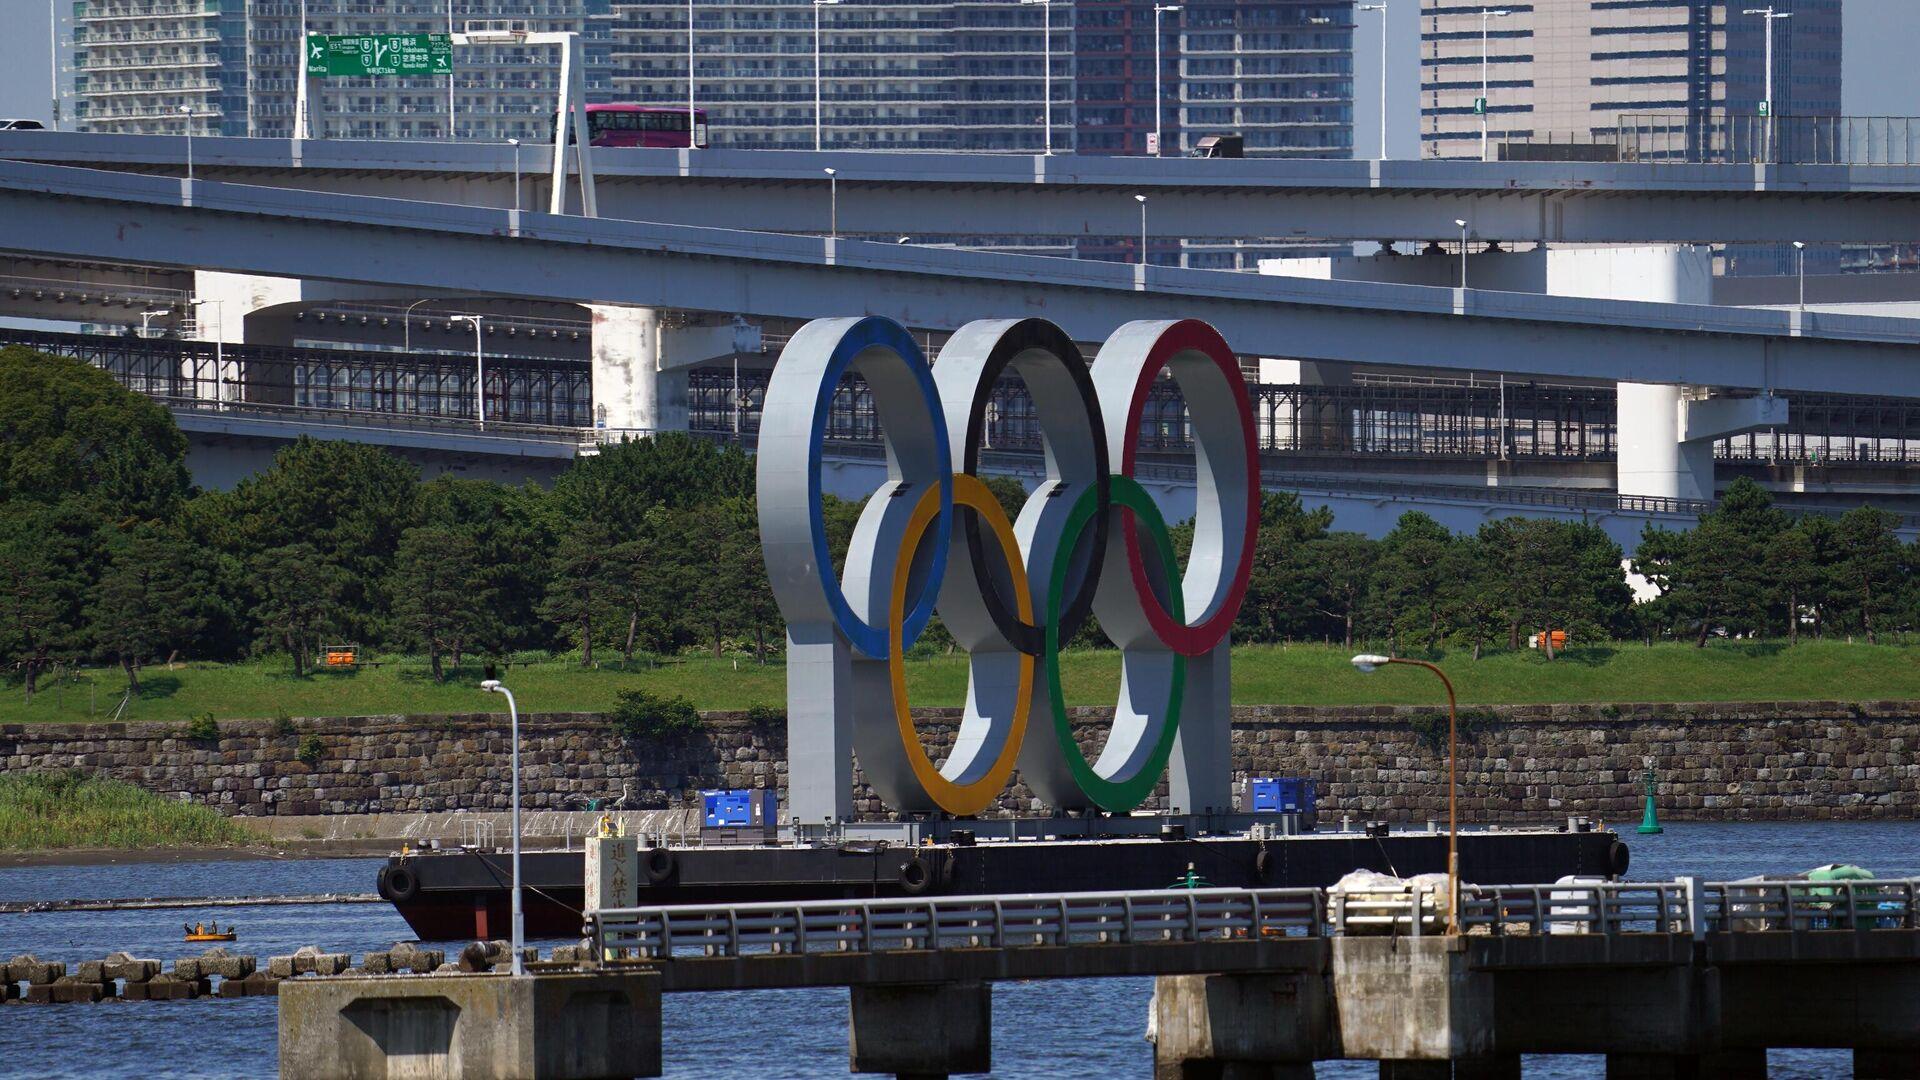 Токио накануне открытия Олимпийских игр - РИА Новости, 1920, 23.07.2021